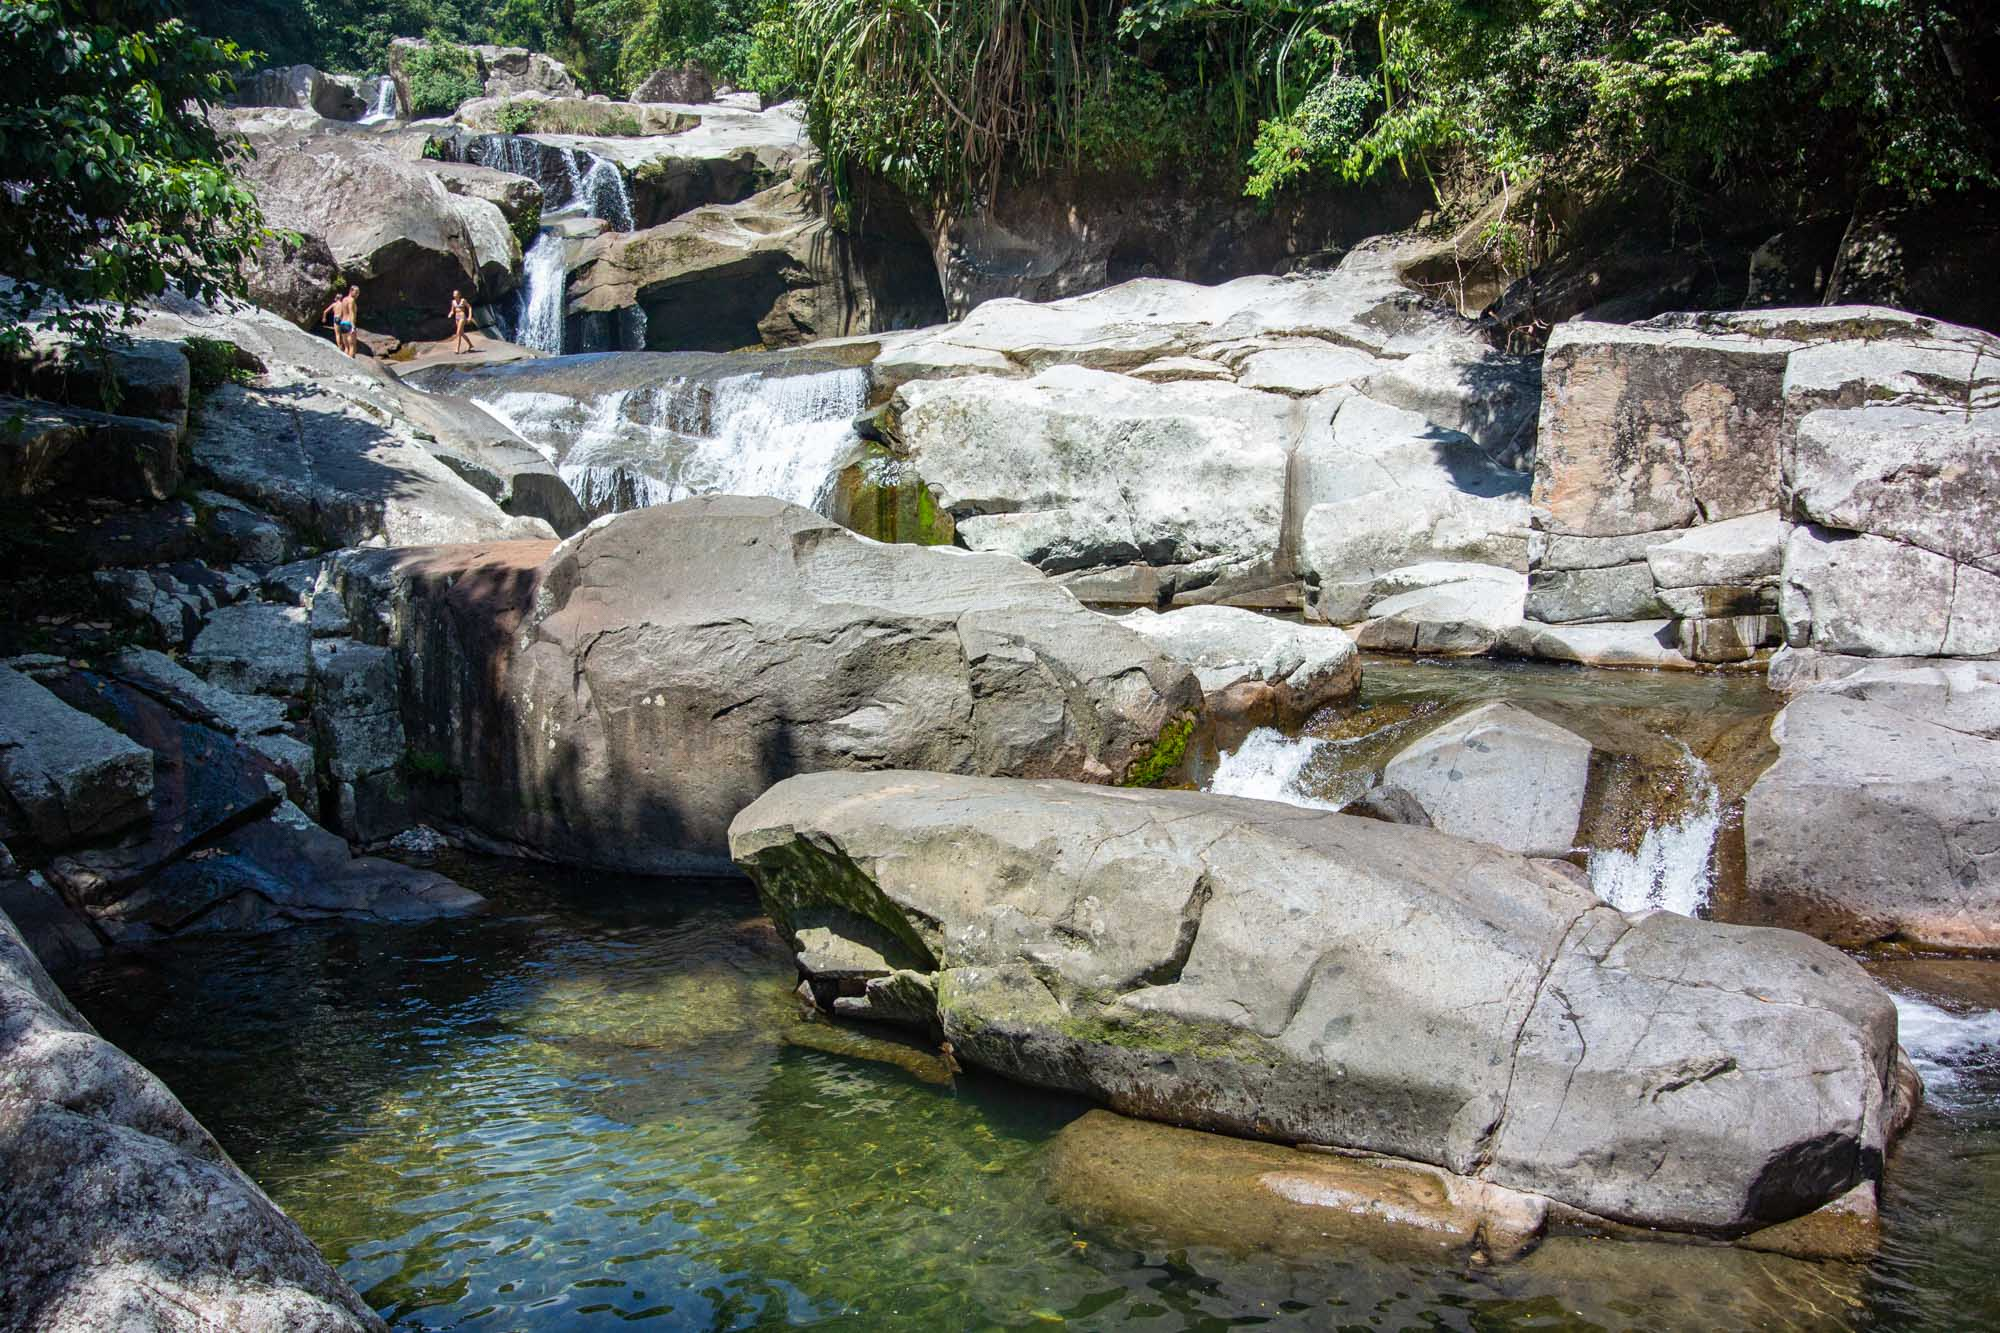 Sungai Pinang